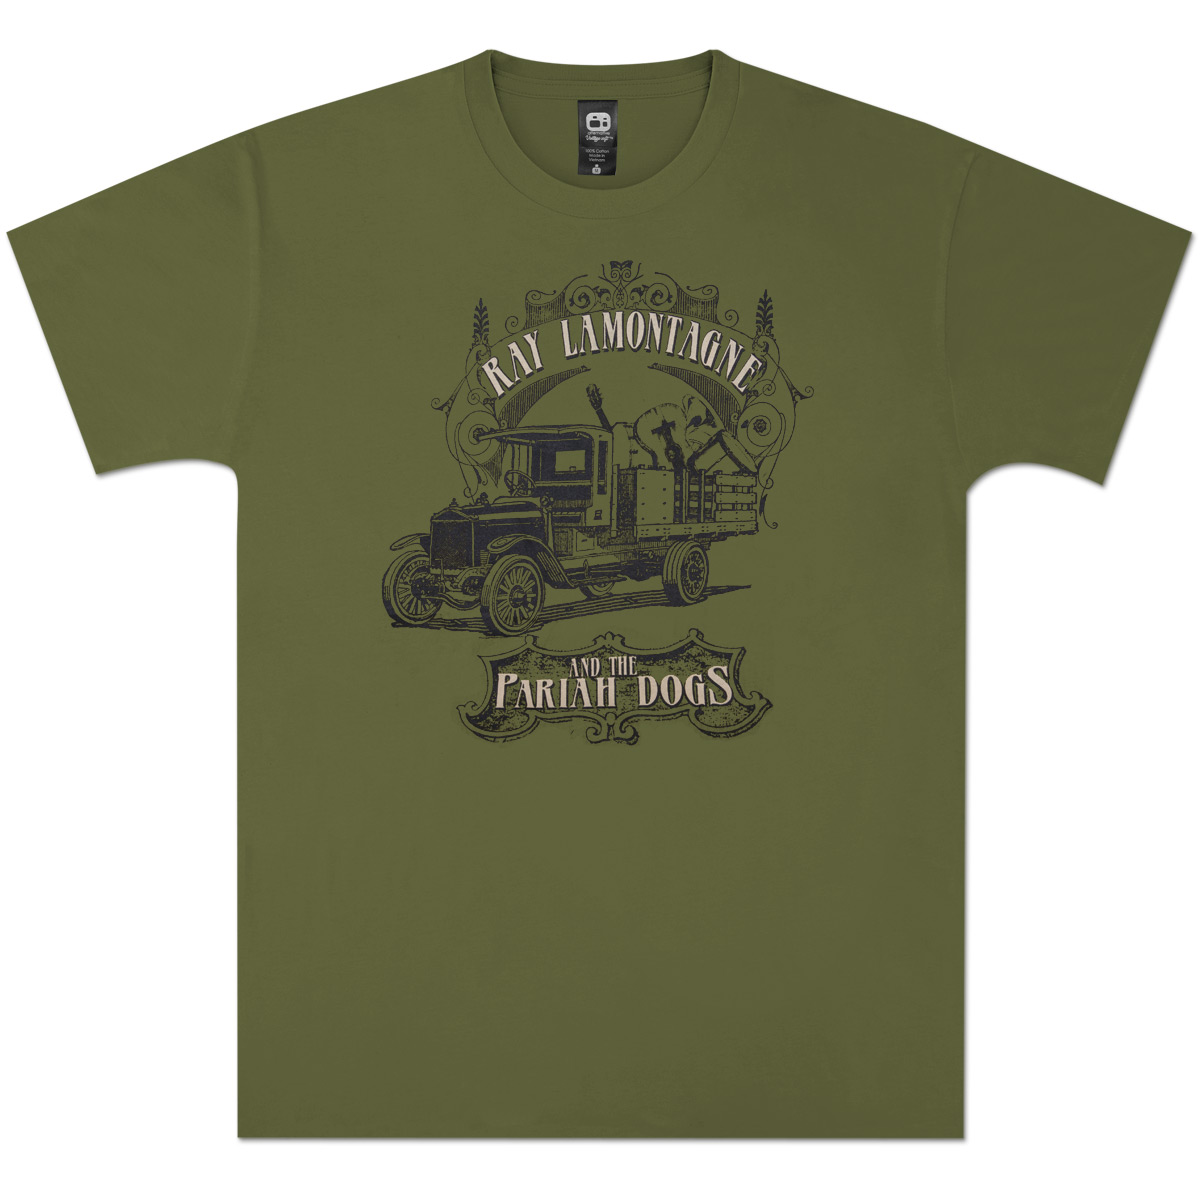 Ray LaMontagne Truck T-shirt